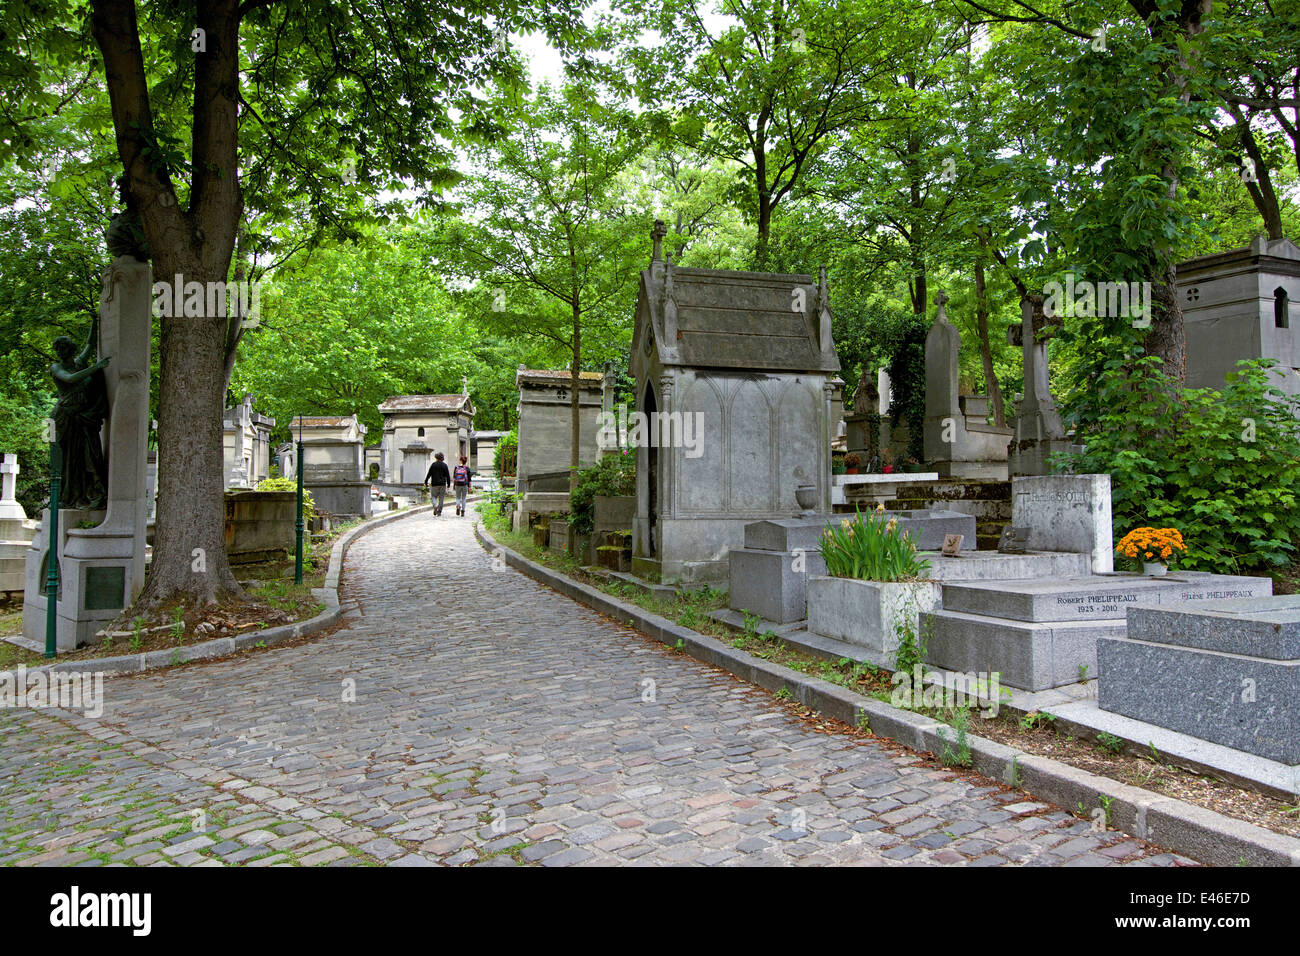 Tombs, Père Lachaise cemetery, Paris, France, Europe - Stock Image